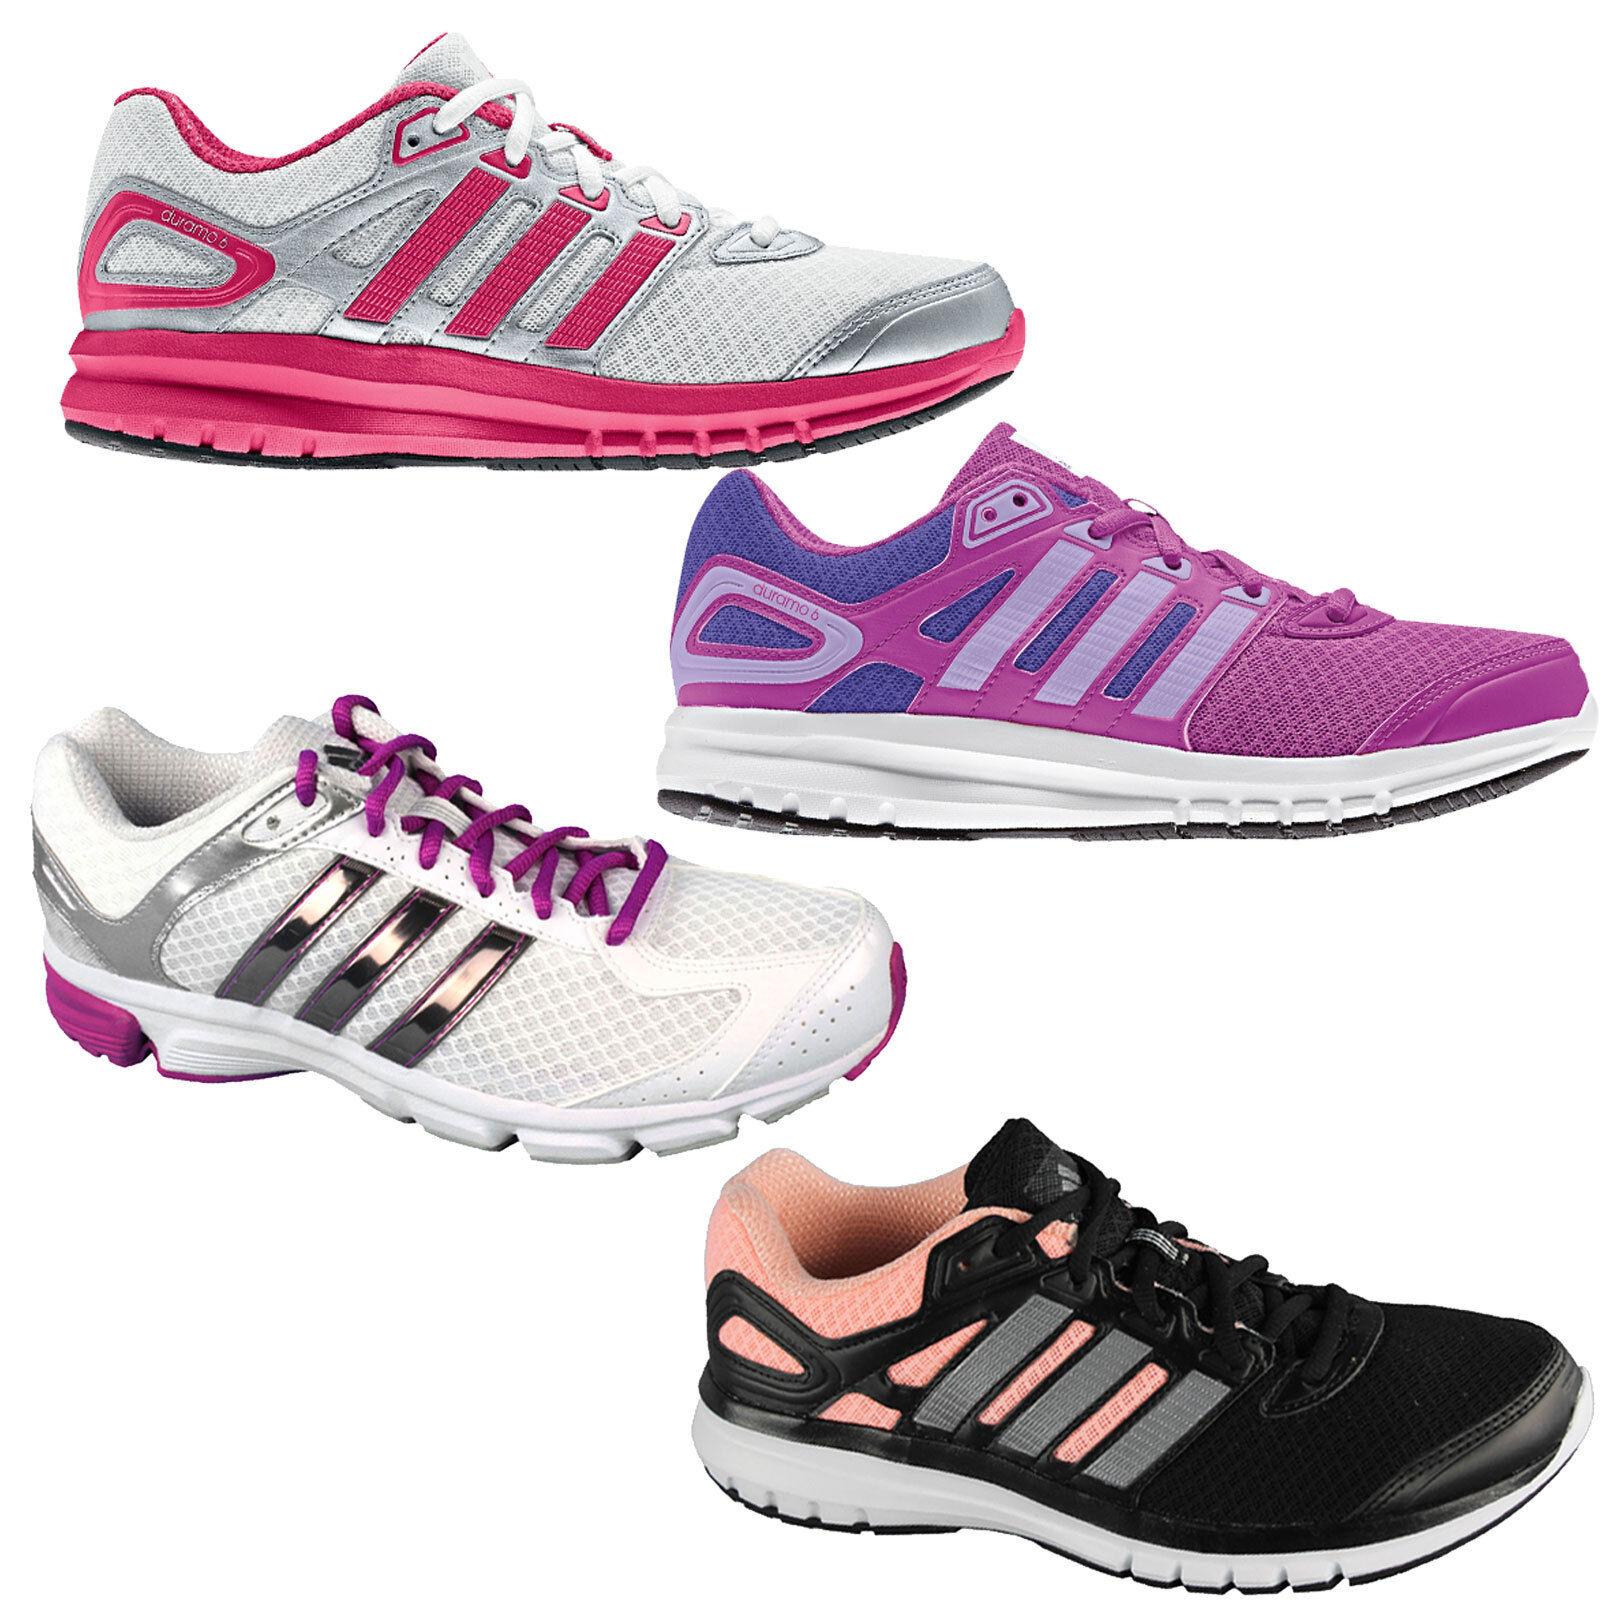 Adidas Performance Duramo Damen-Laufschuhe Sportschuhe Turnschuhe Schuhe  | Shop